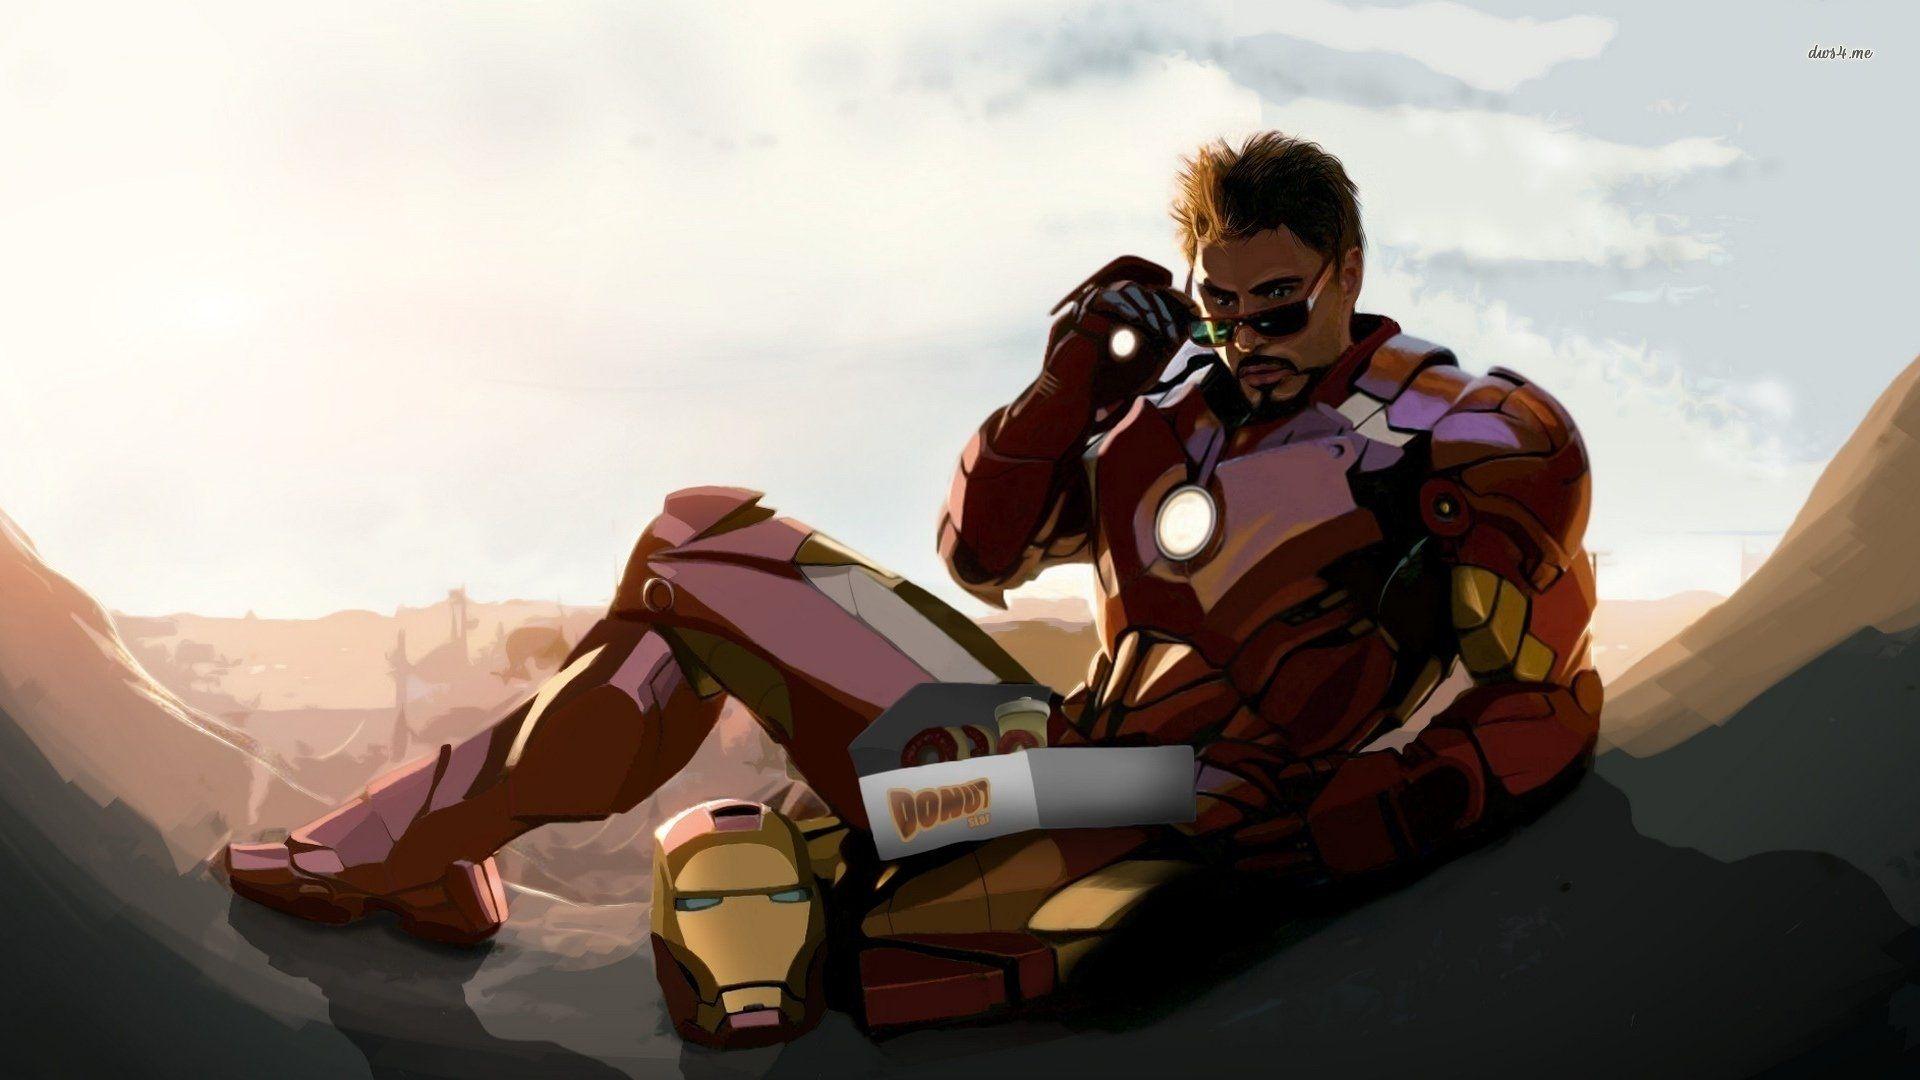 iron man hd wallpaper free download